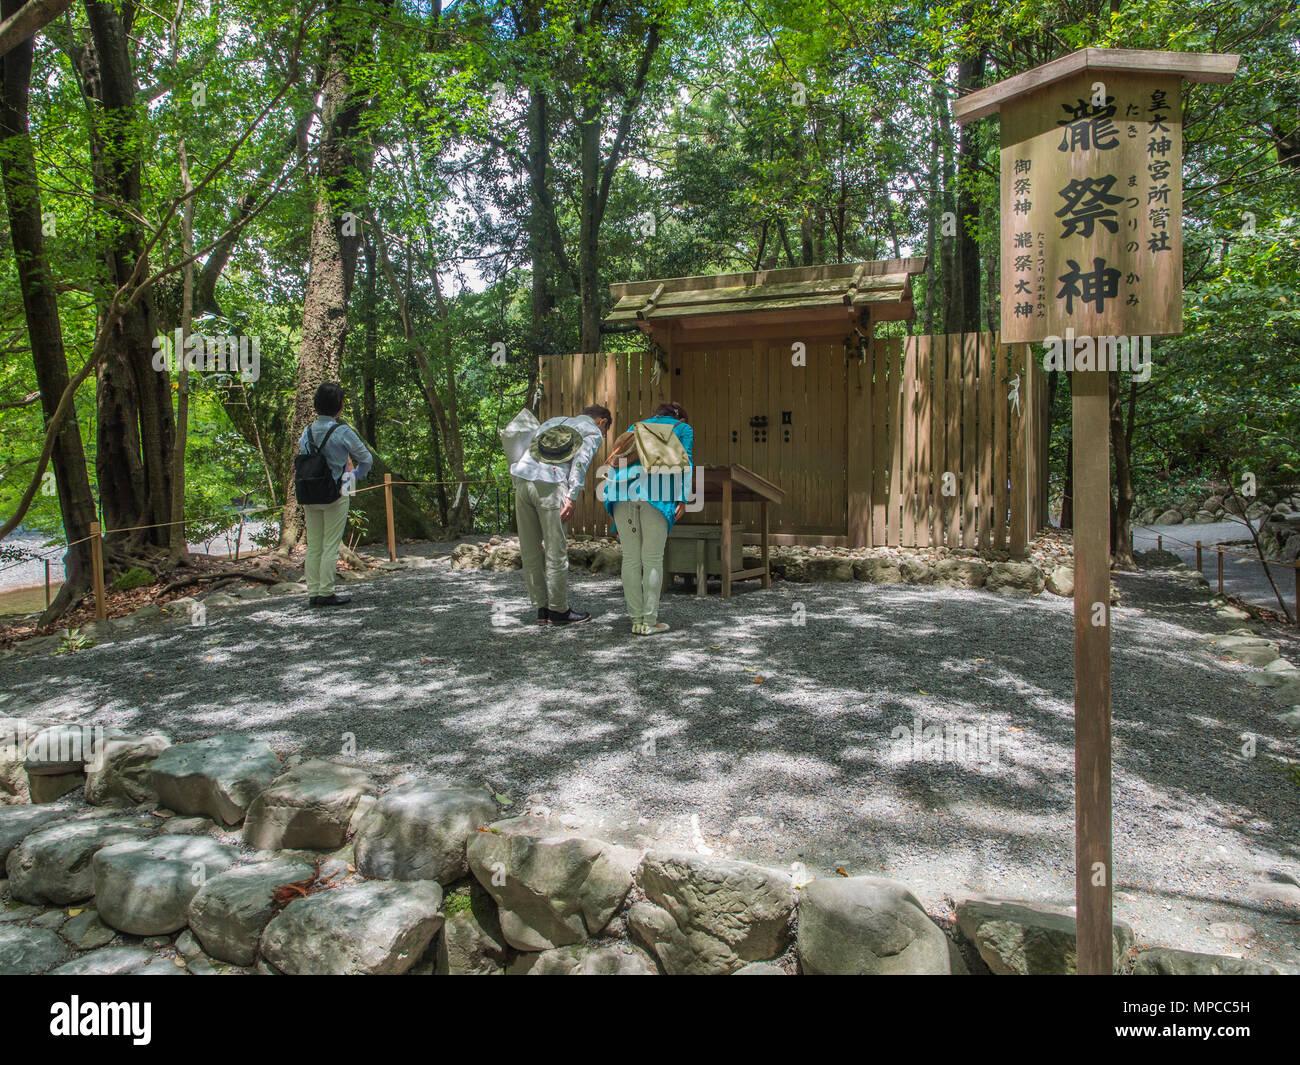 Visitors praying, Takimatsuri-no-kami subordinate shrine, Naiku, Ise Jingu, Mie, Japan - Stock Image